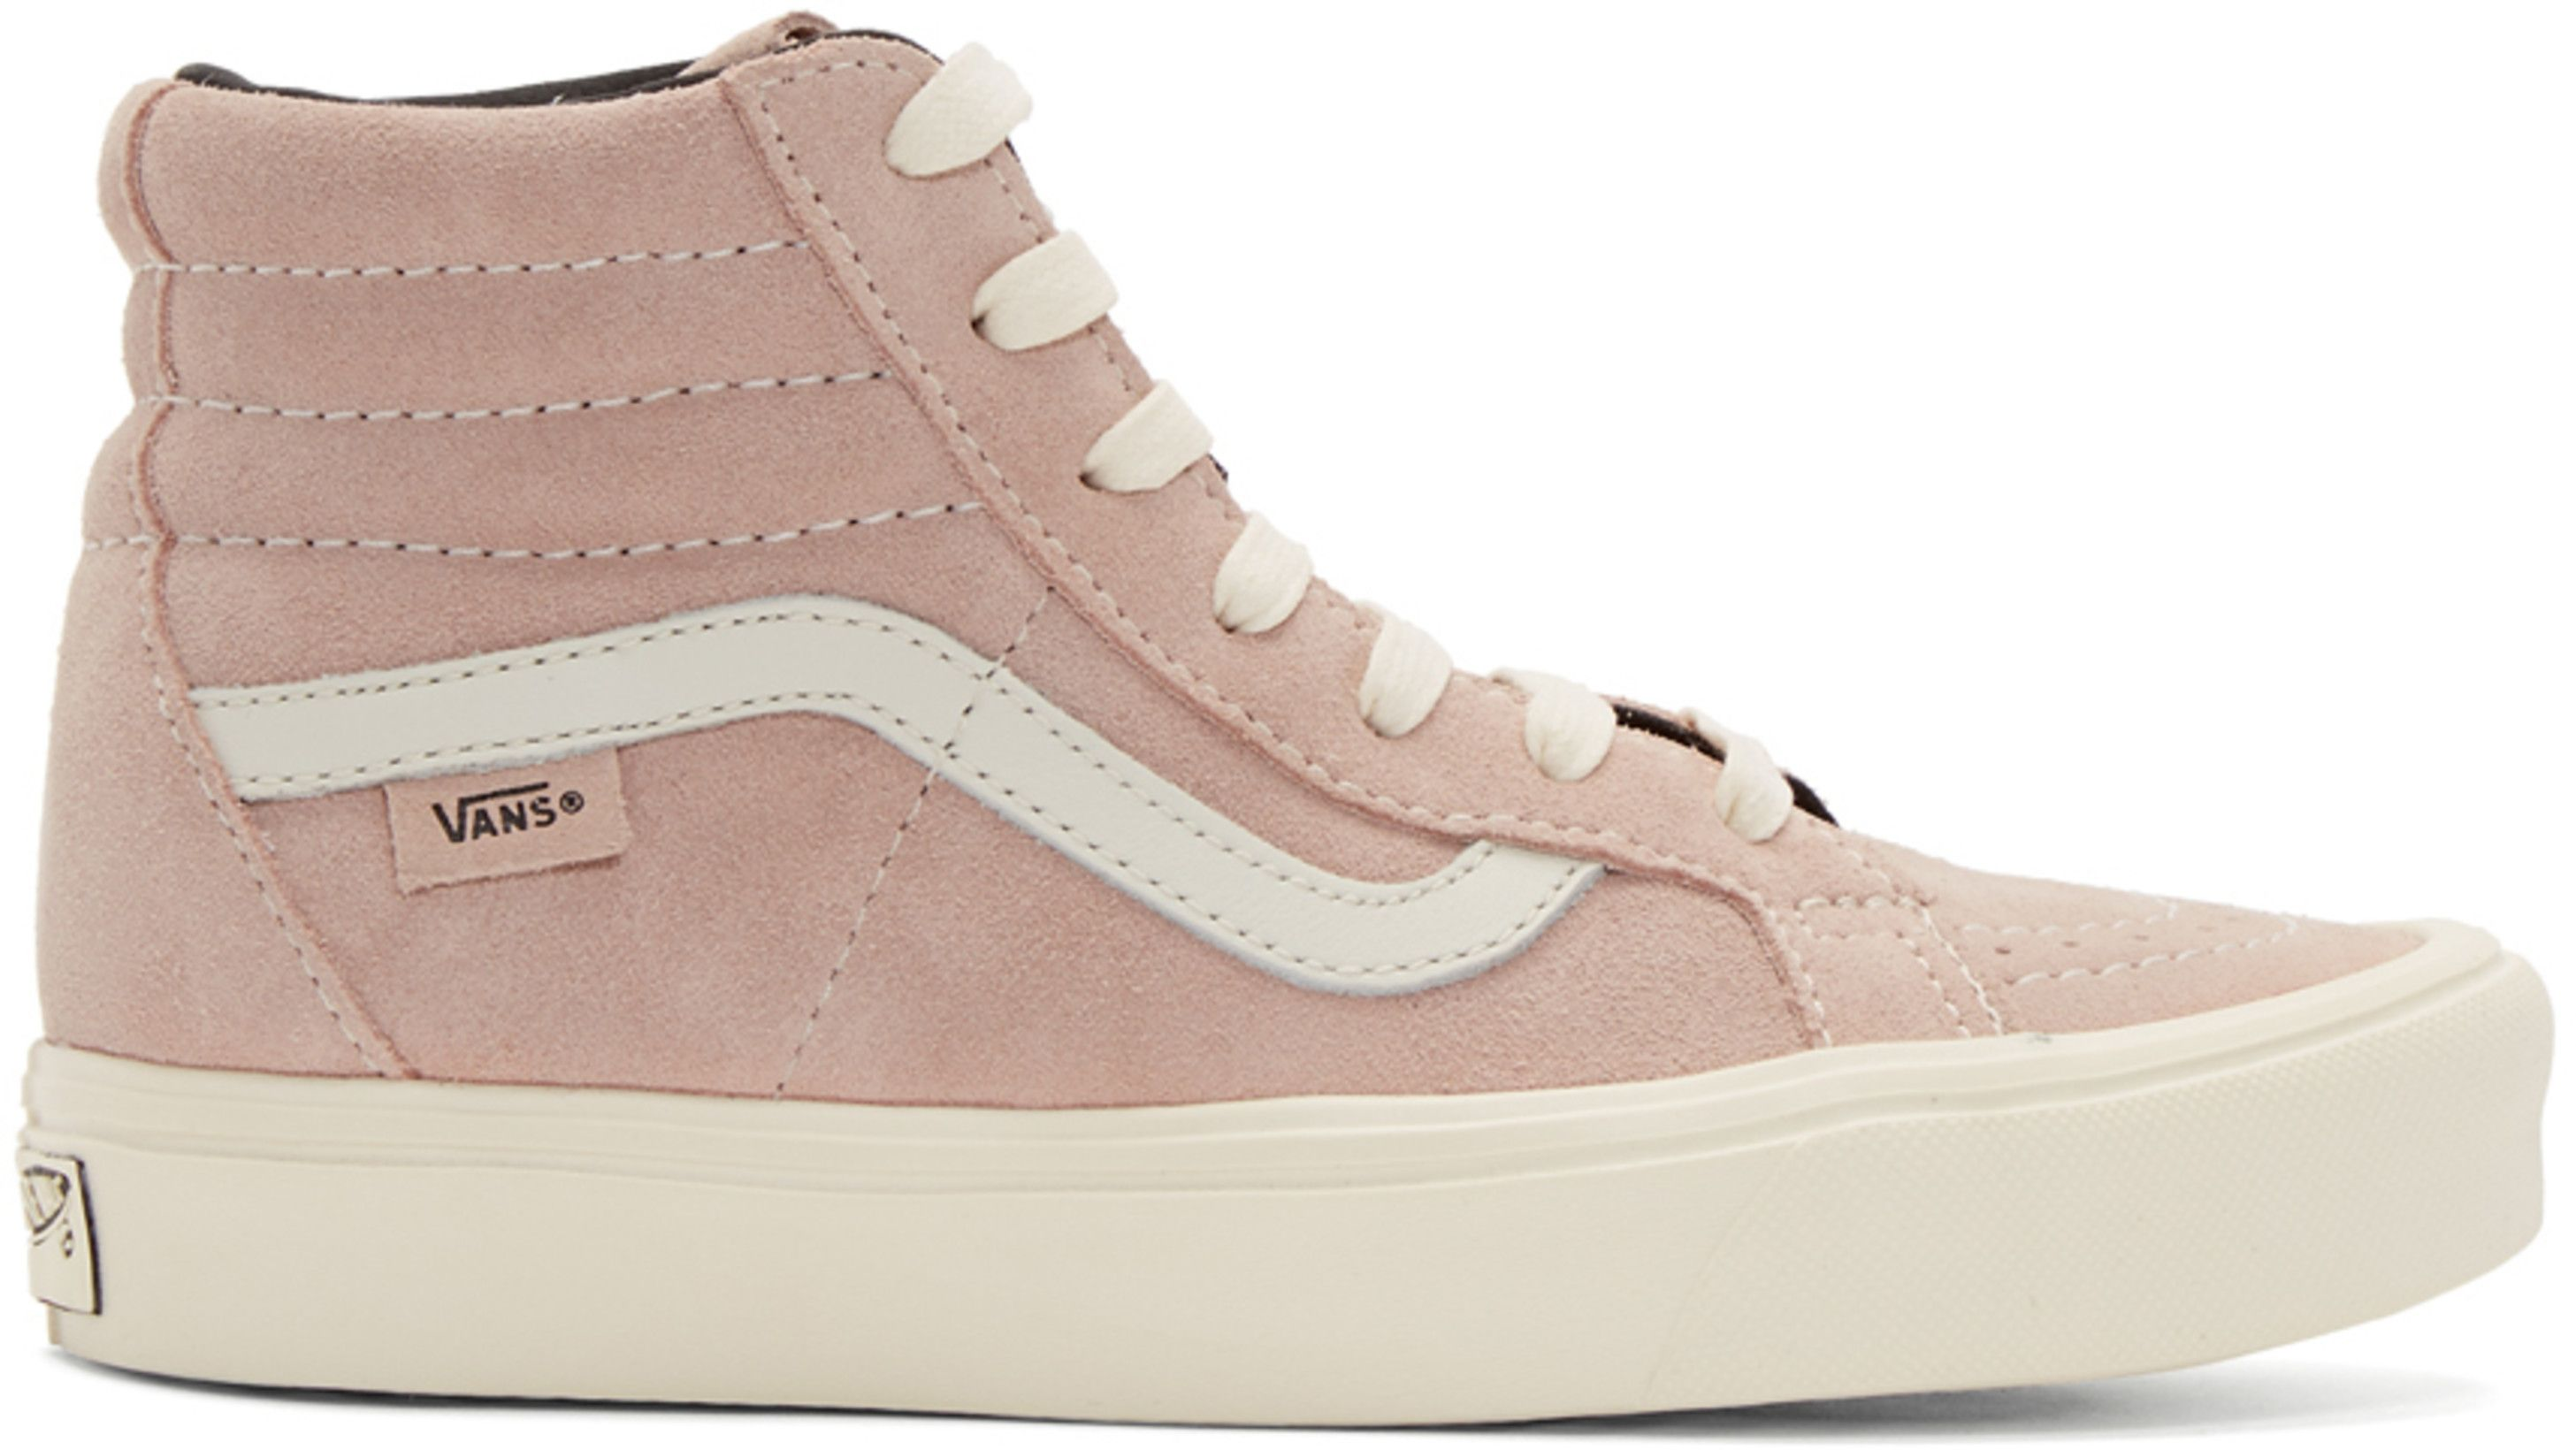 4d46f9f32d Vans - Pink SK8-Hi Reissue Lite LX High-Top Sneakers